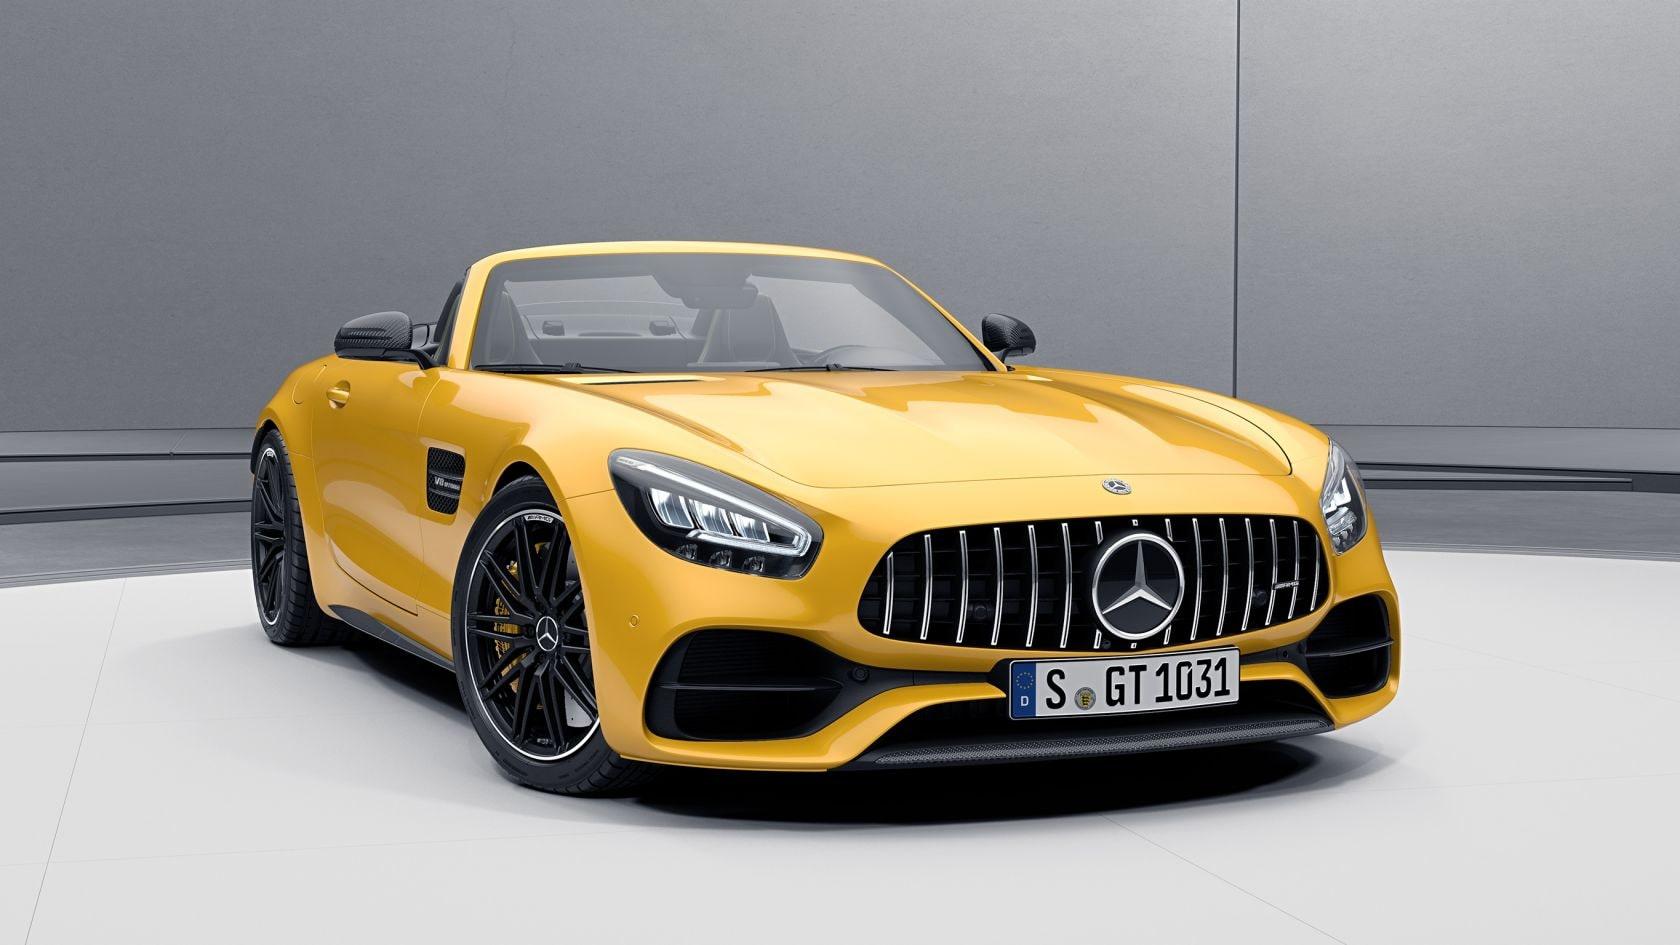 Mercedes Amg Gt Roadster Amg Exterior Carbon Fibre Package